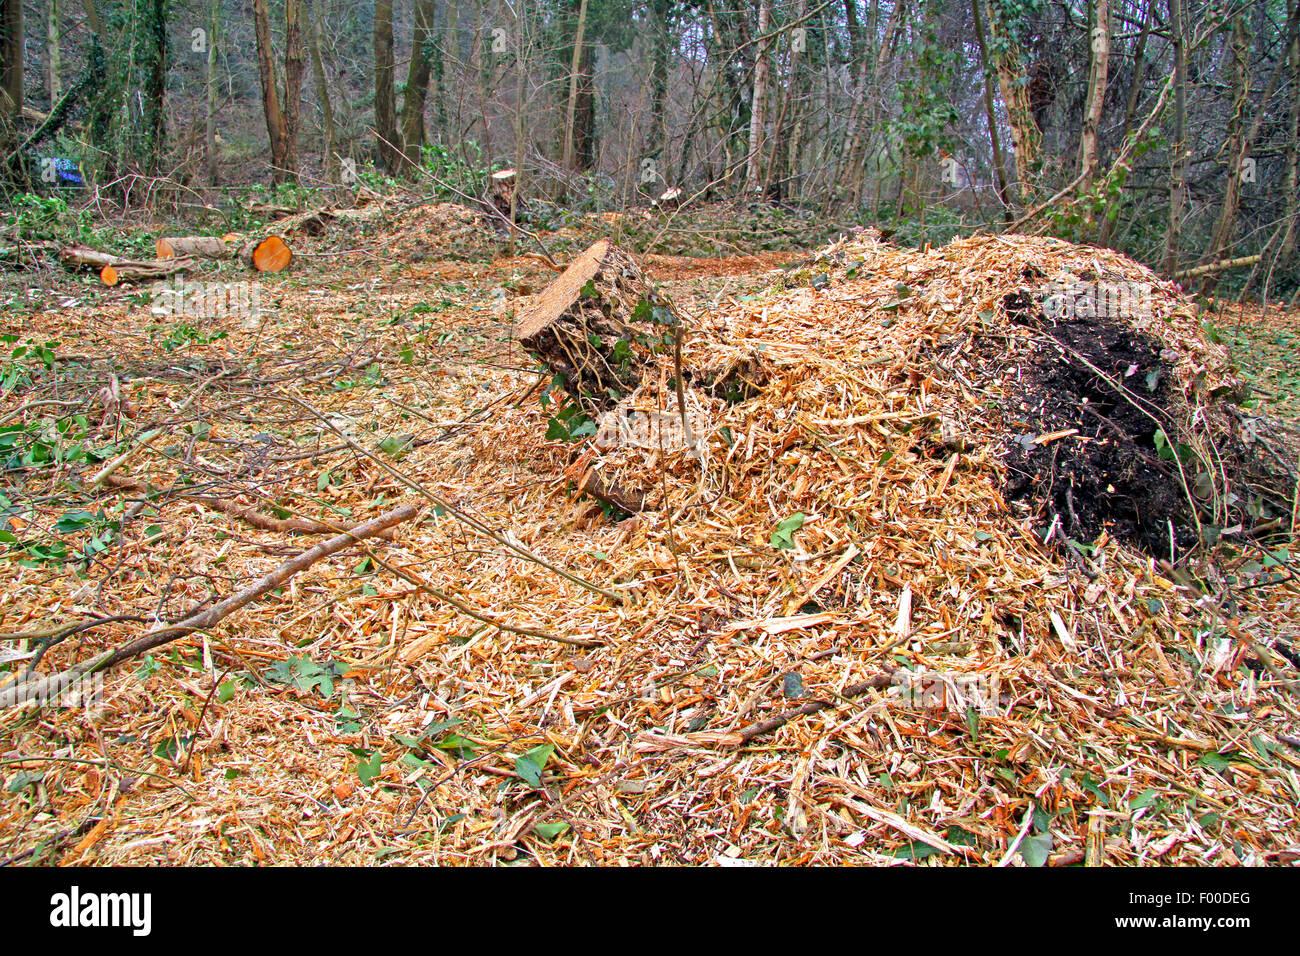 tree stub and chaffs, Germany - Stock Image